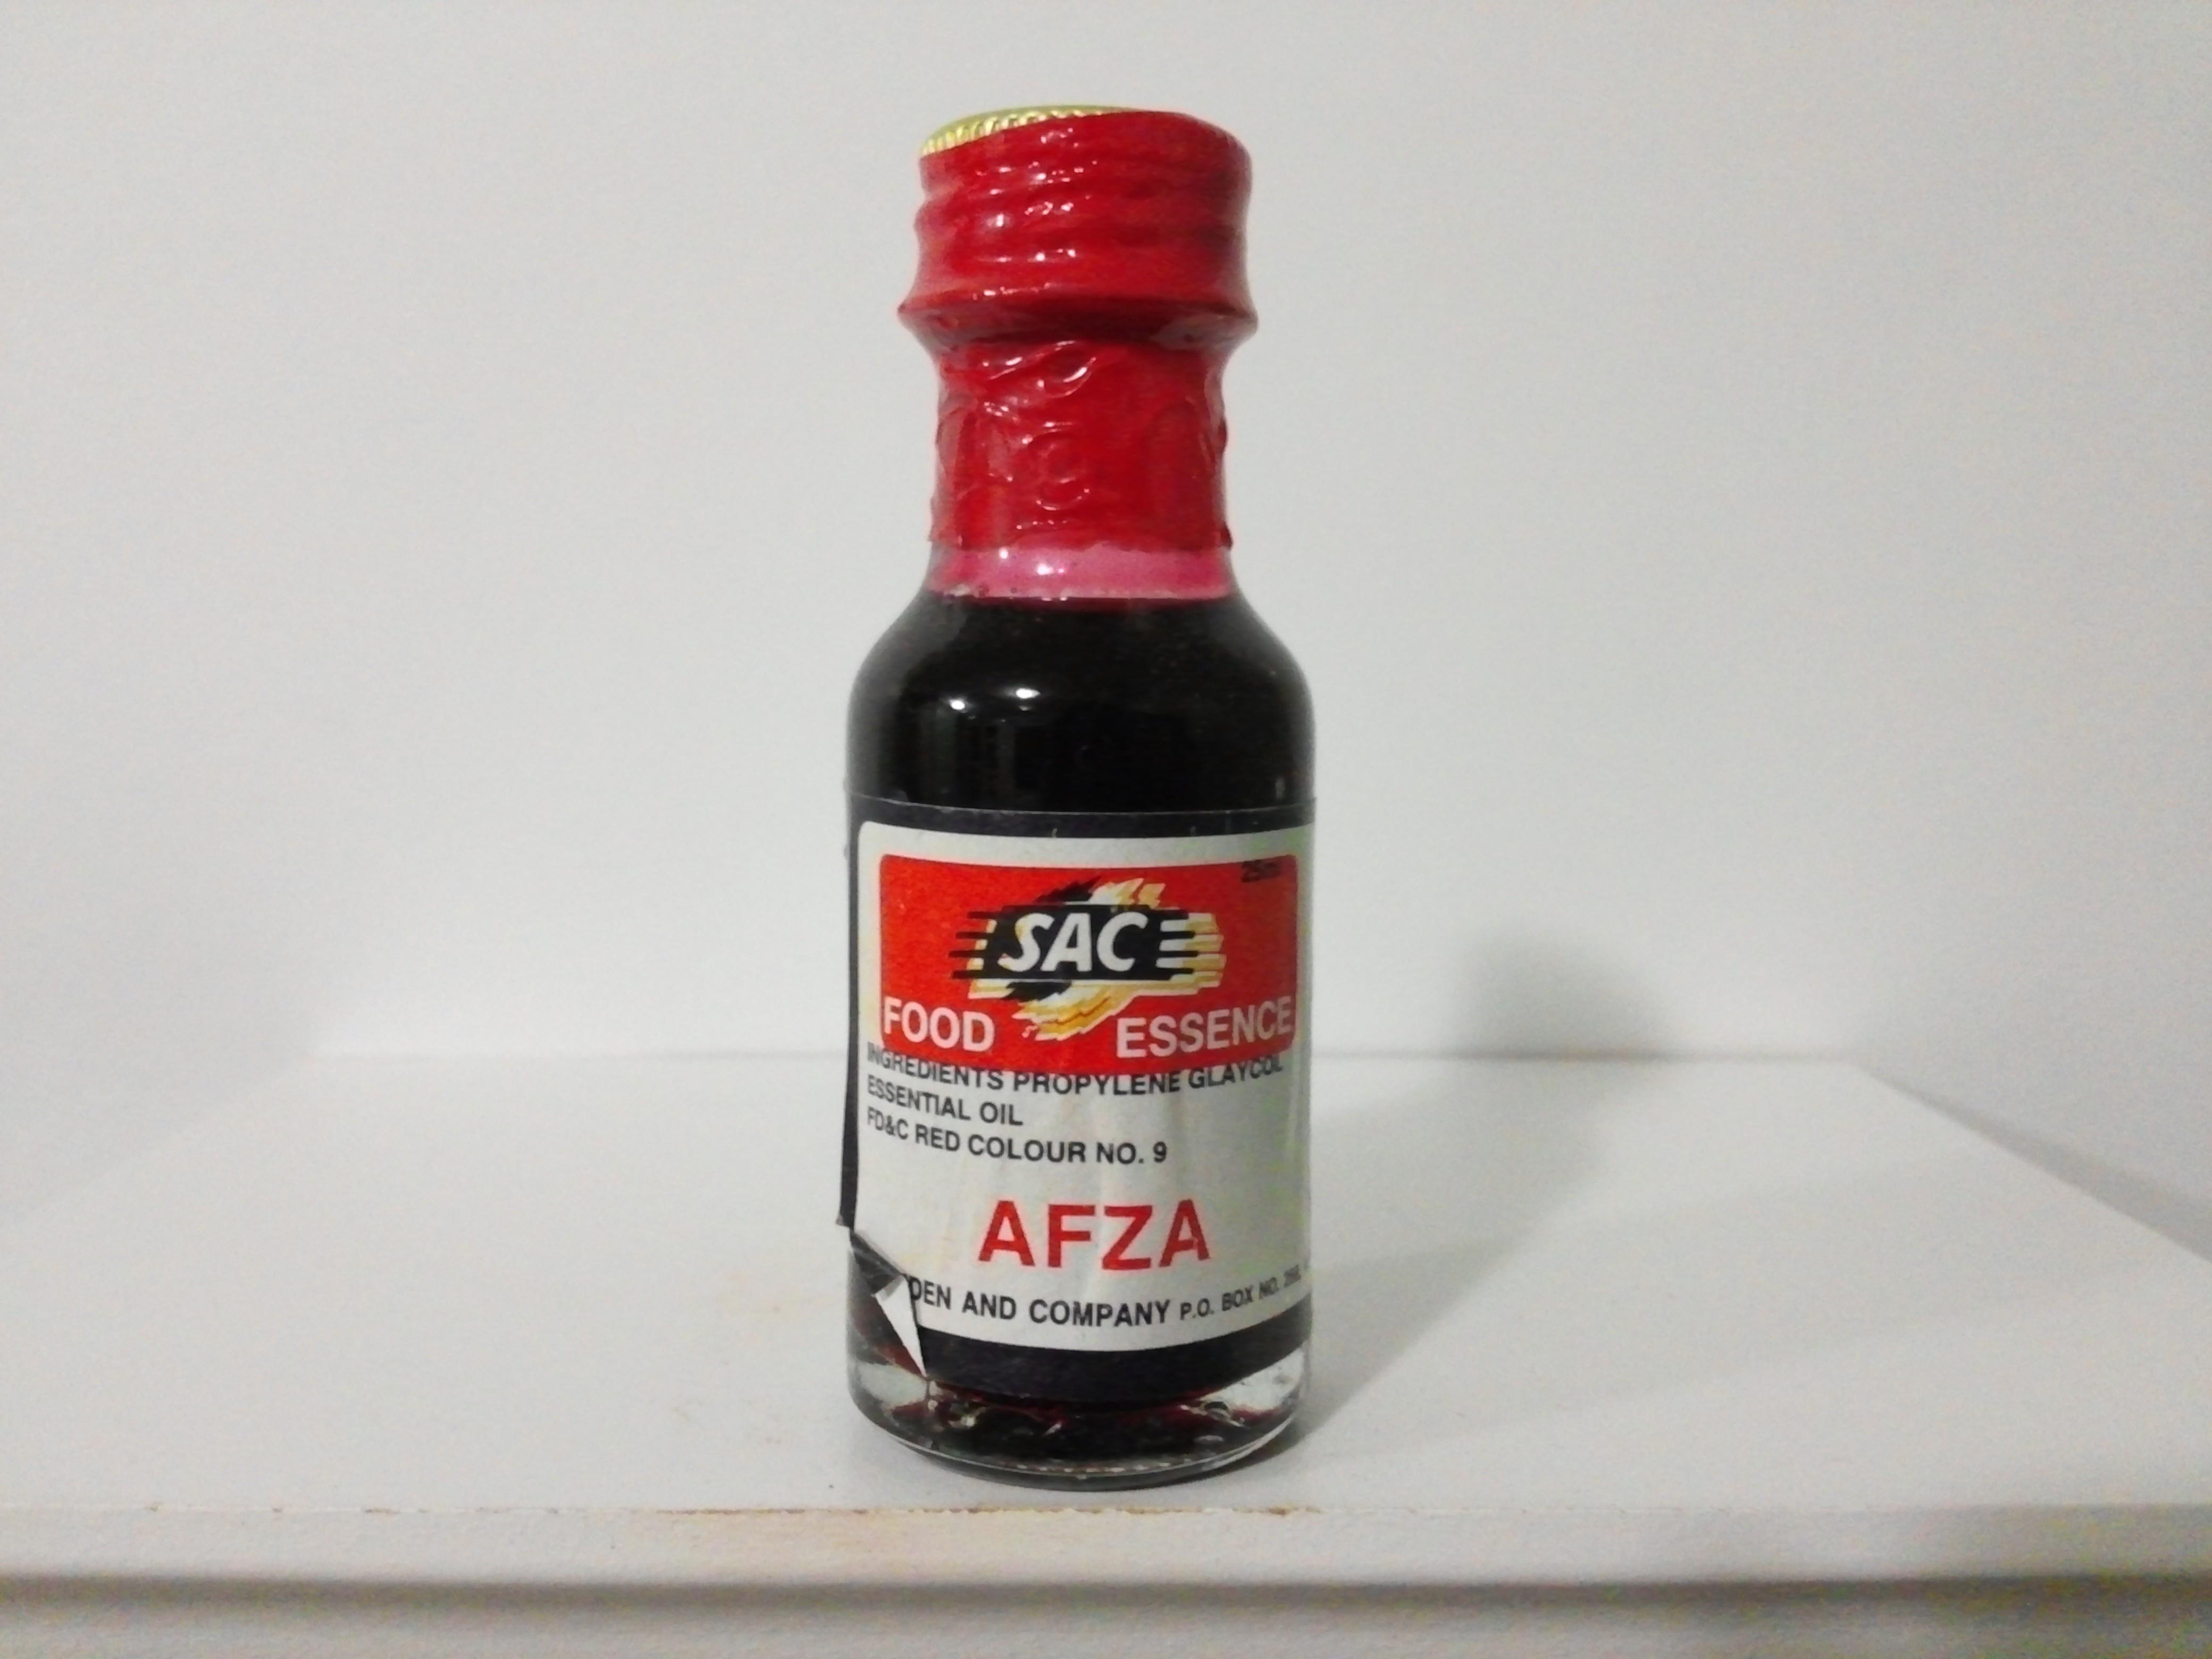 SAC Afza Food Essence